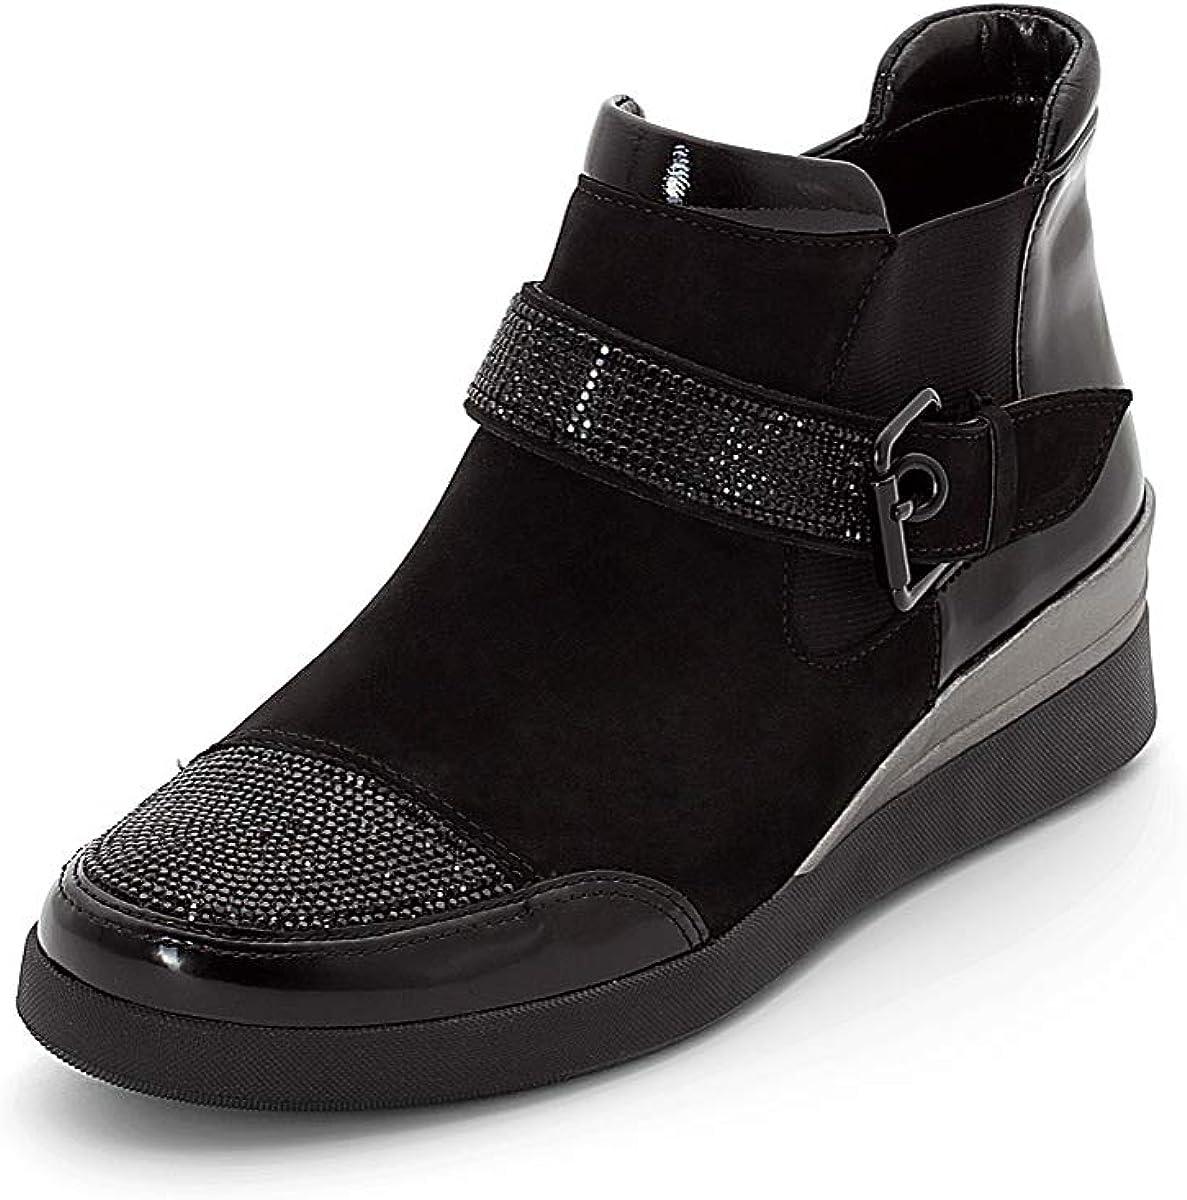 Jenny ARA Ara Womens Ankle Boot 43330